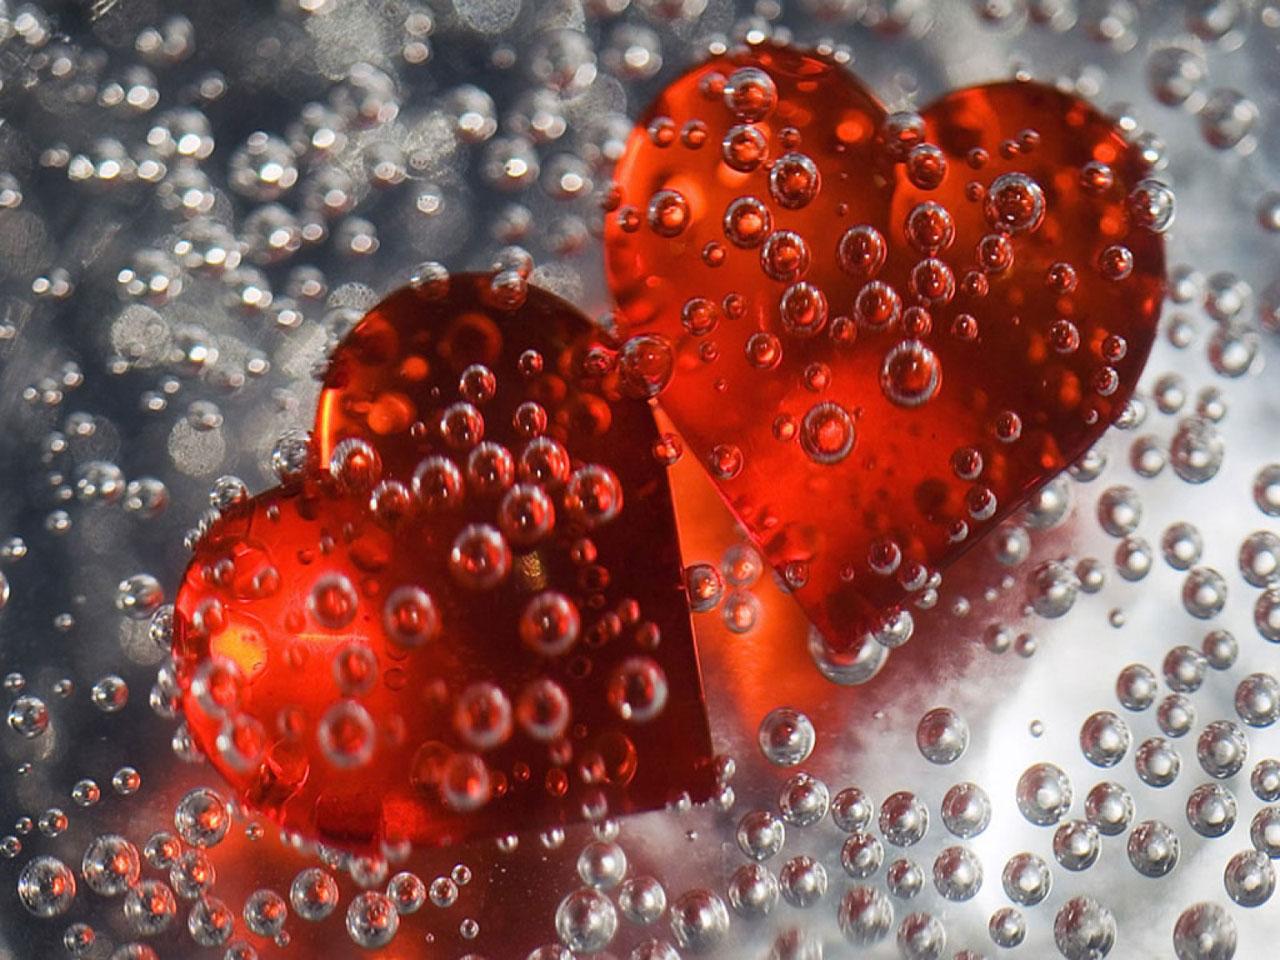 Download Wallpapers Emo Heart Wallpapers 1280x960